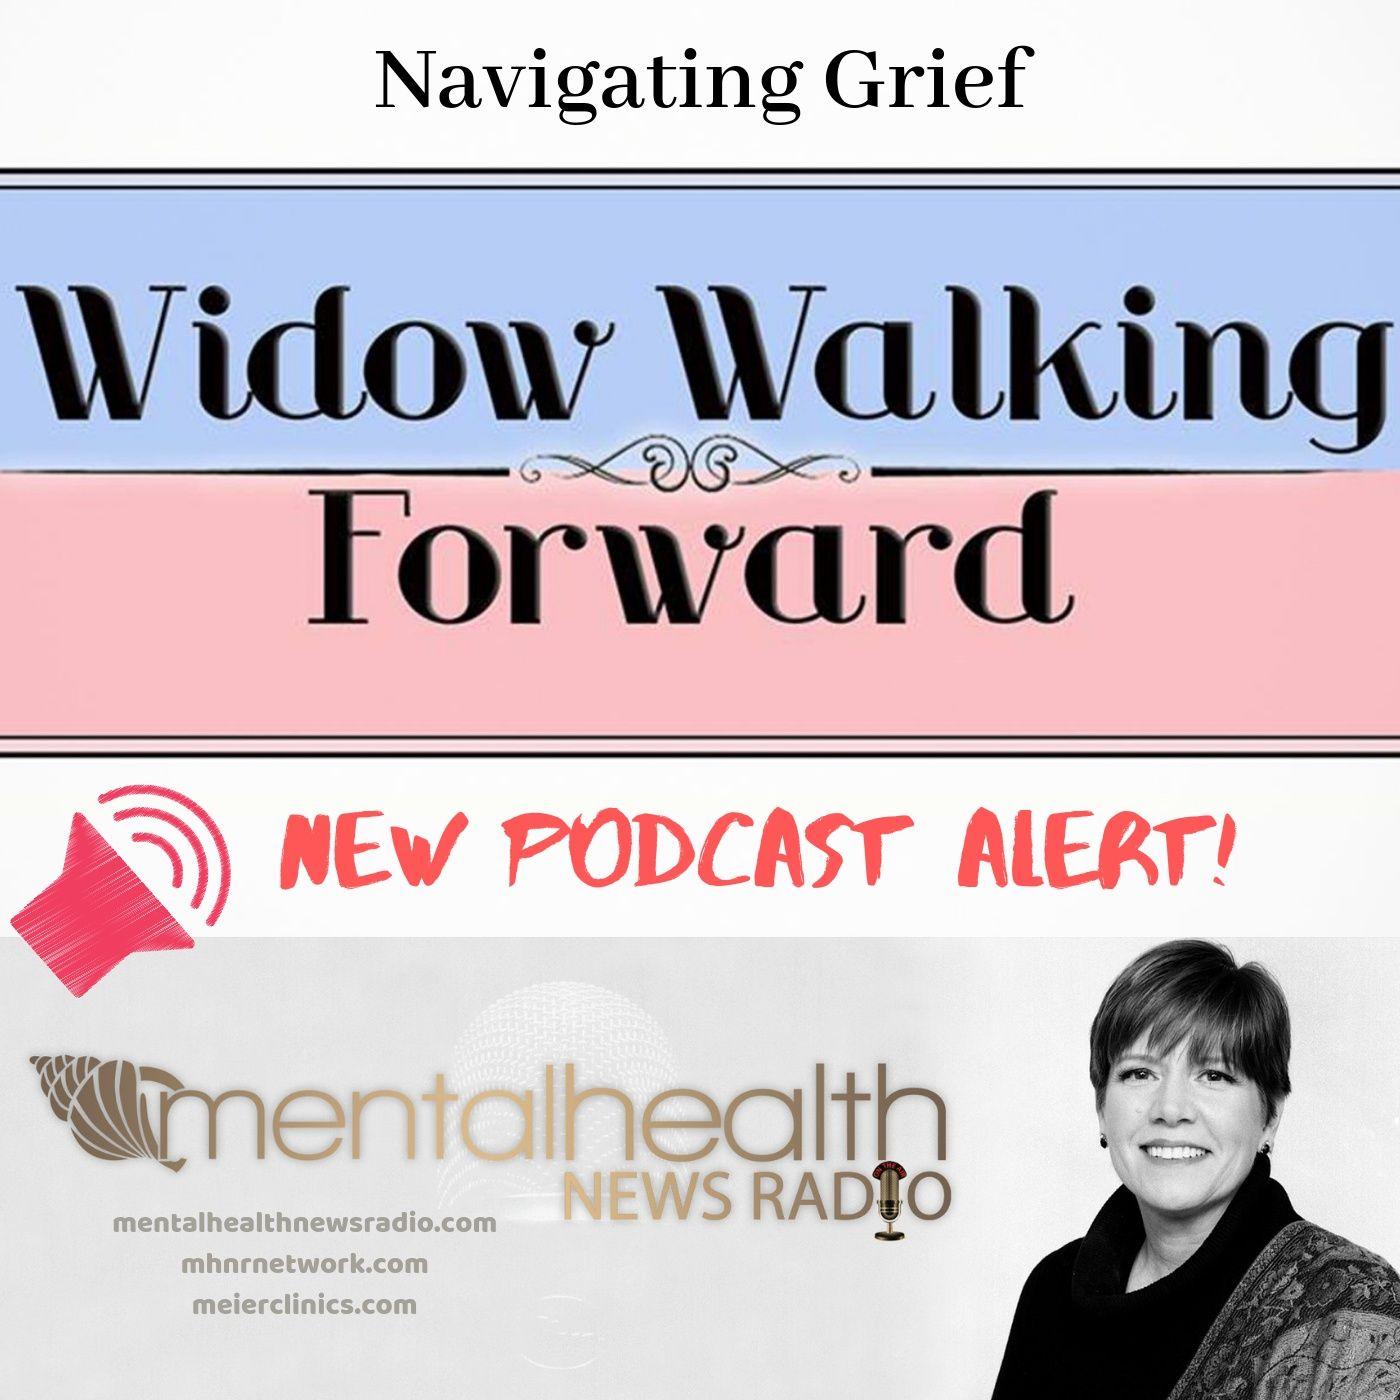 Mental Health News Radio - Widow Walking Forward: Navigating Grief